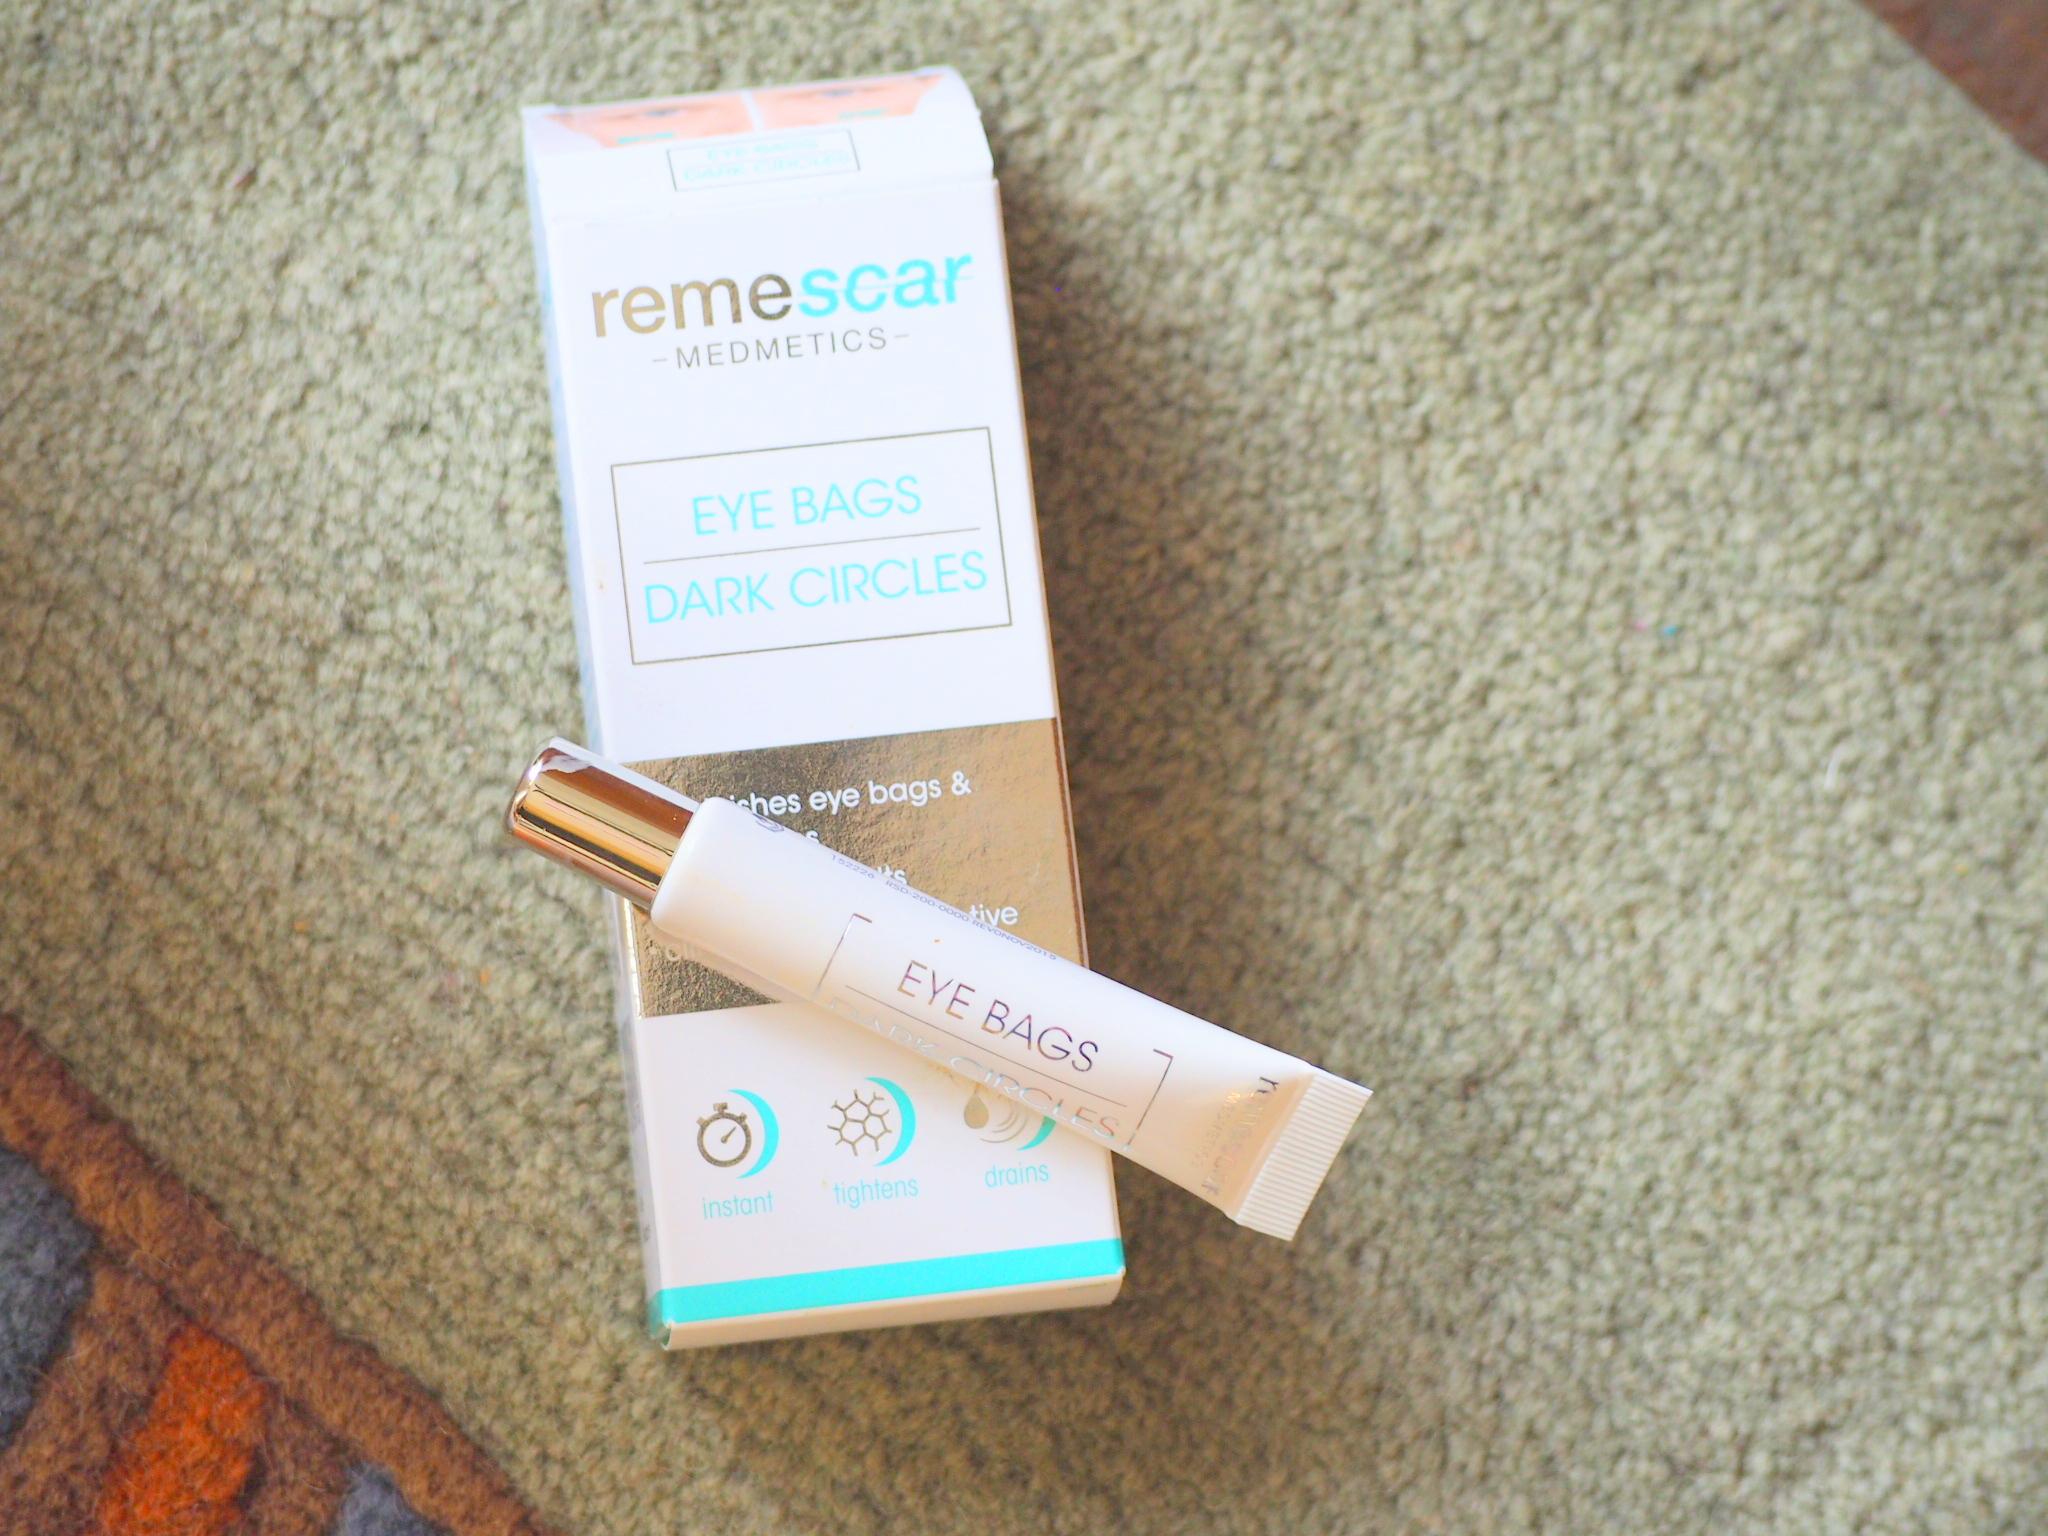 {Review & Giveaway}-Remescar Eye Bags & Dark Circles cream!